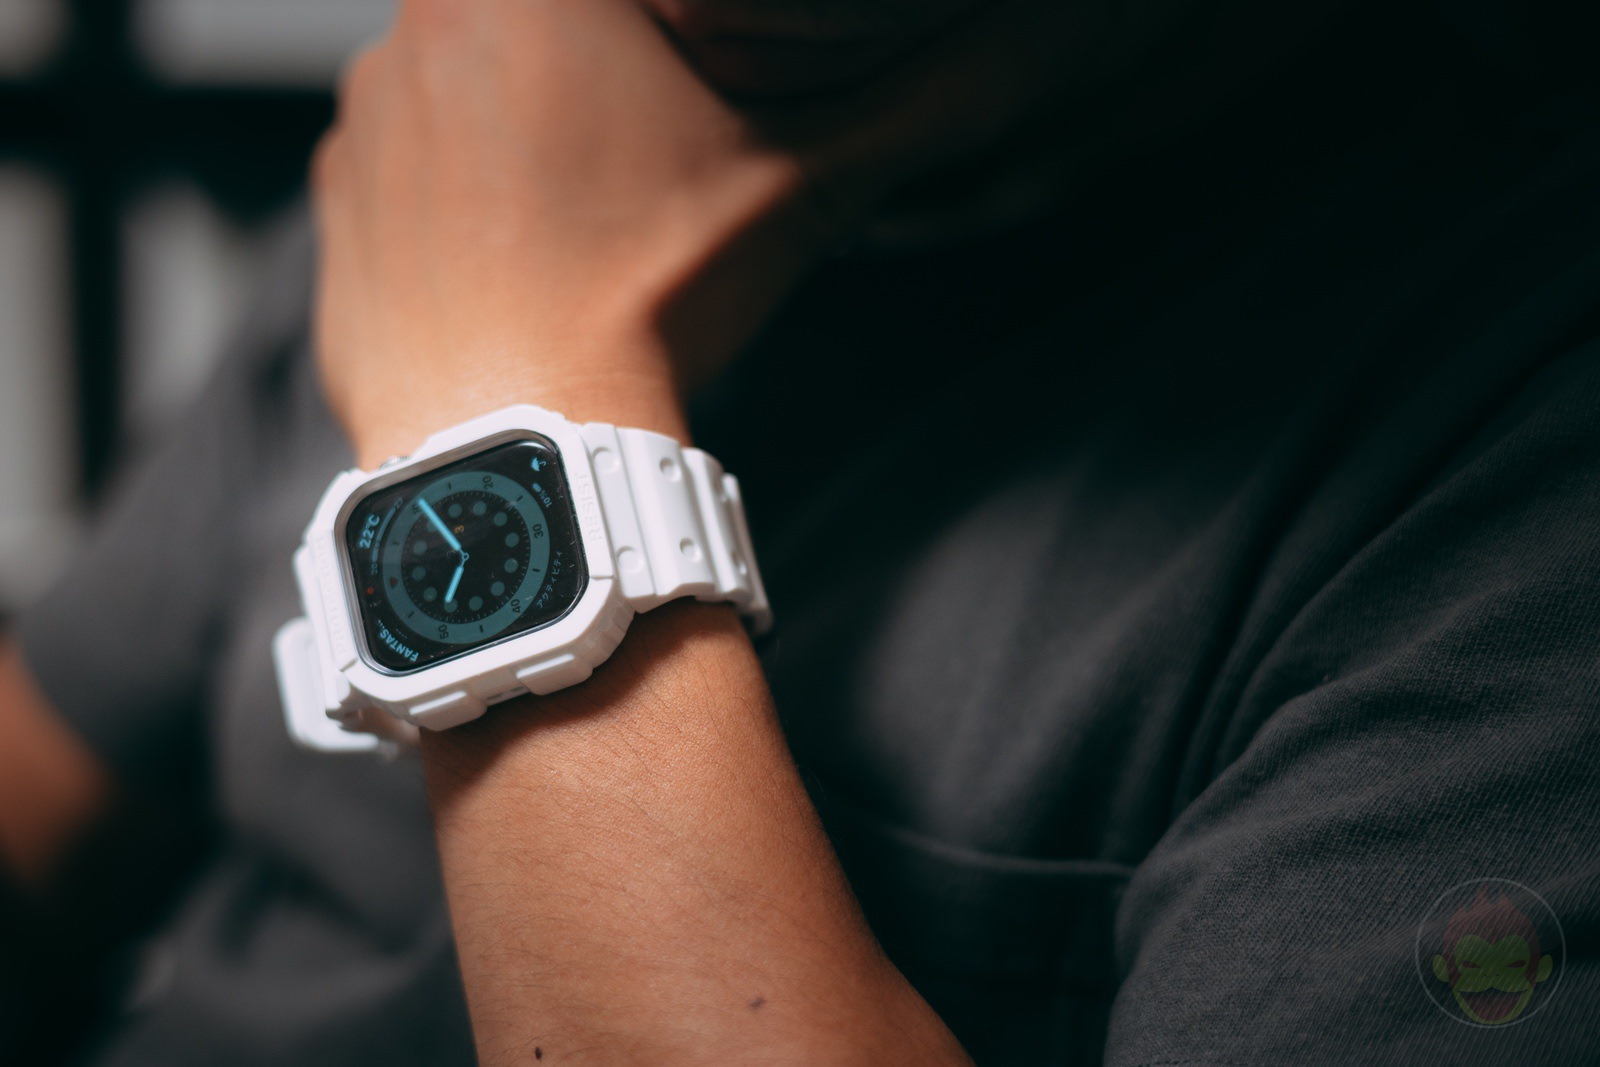 AmBand Apple Watch White G SHOCK Case 08